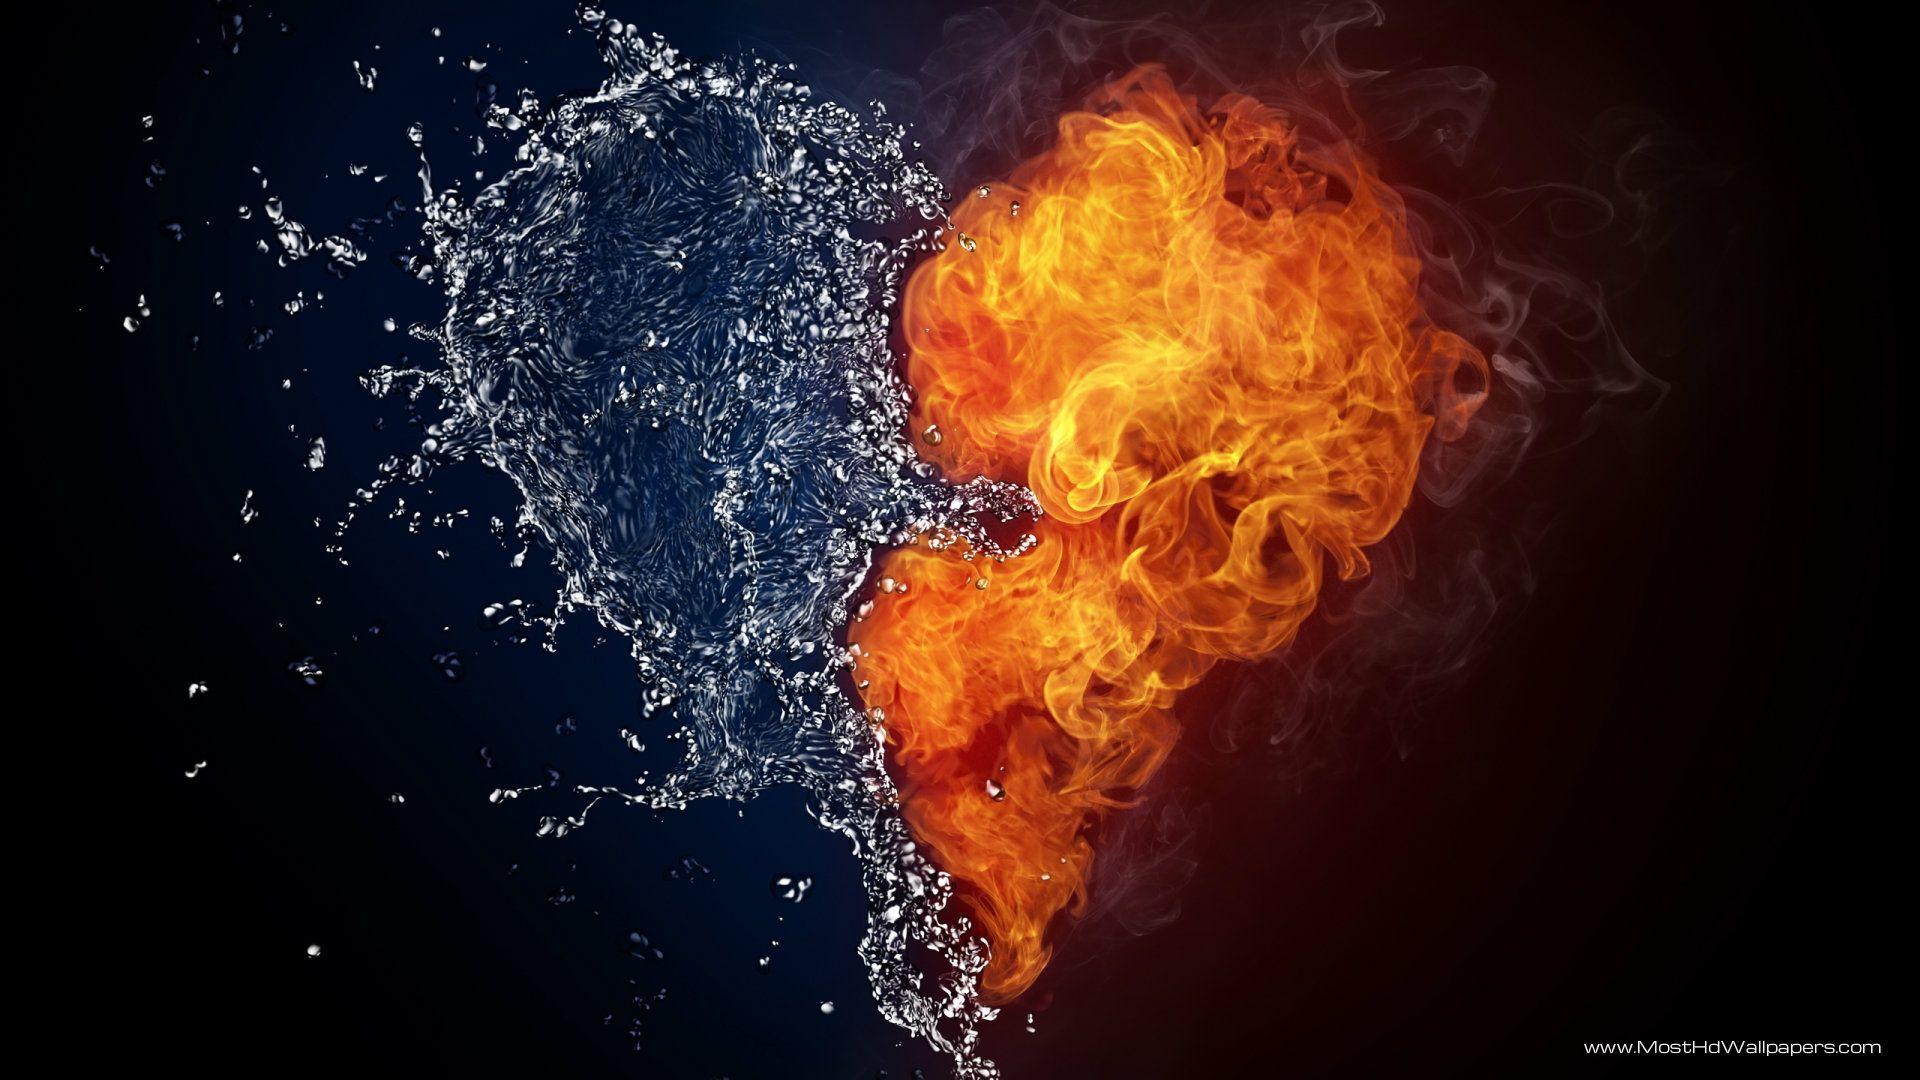 Cute Love Wallpaper Full Hd Download Desktop Mobile Backgrounds 1024 768 Hd Love Wallpaper 39 Wallpapers Adorable Wa Hinh Xăm Nhật Hinh Xăm Qua Sinh Nhật 1080p fire and water wallpaper hd